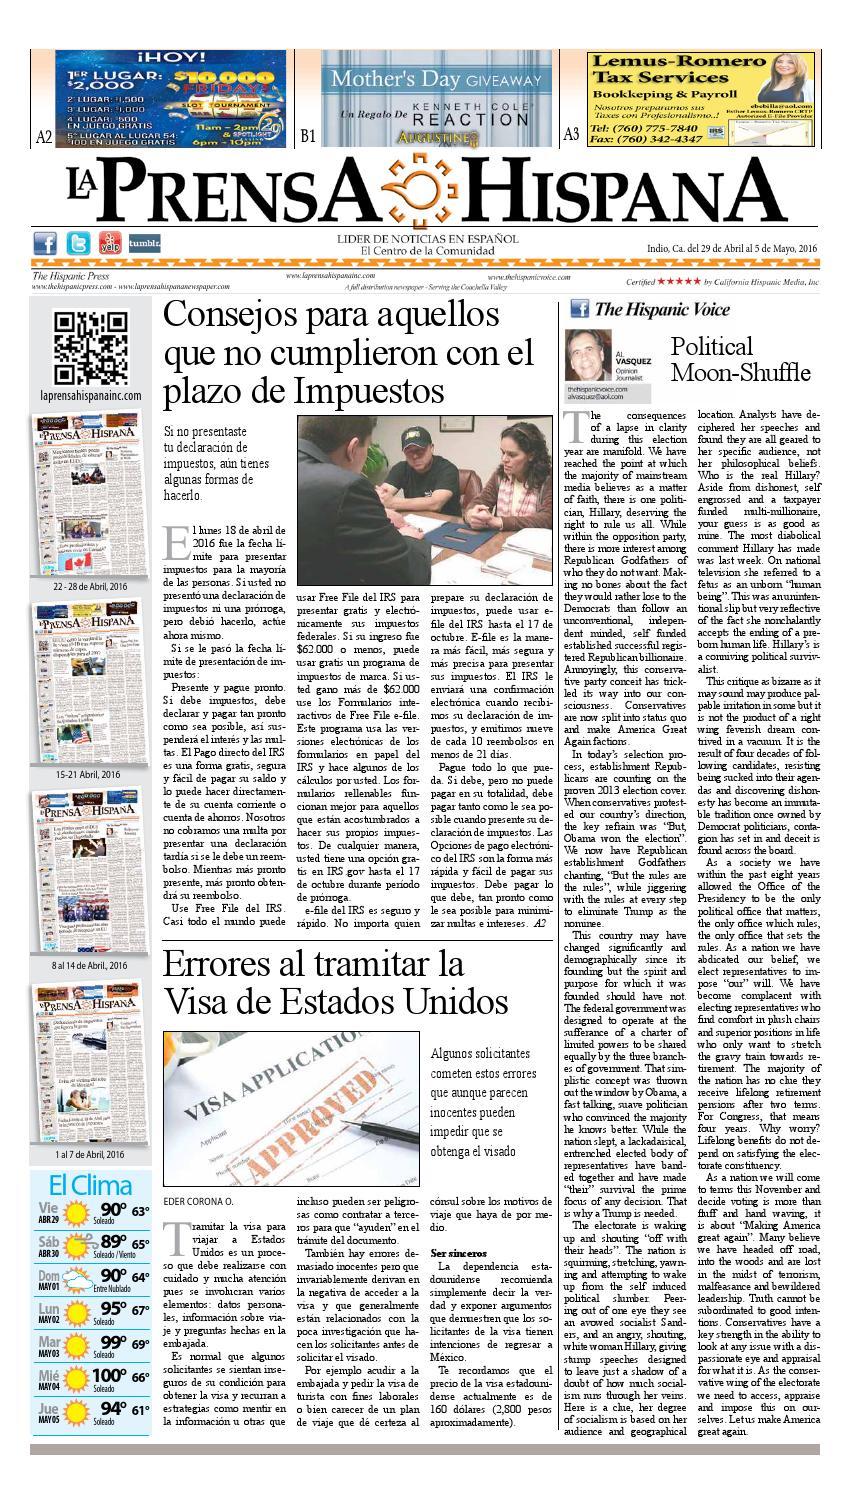 La Prensa Hispana 29 Abril - 5 Mayo, 2016 by La Prensa Hispana - issuu